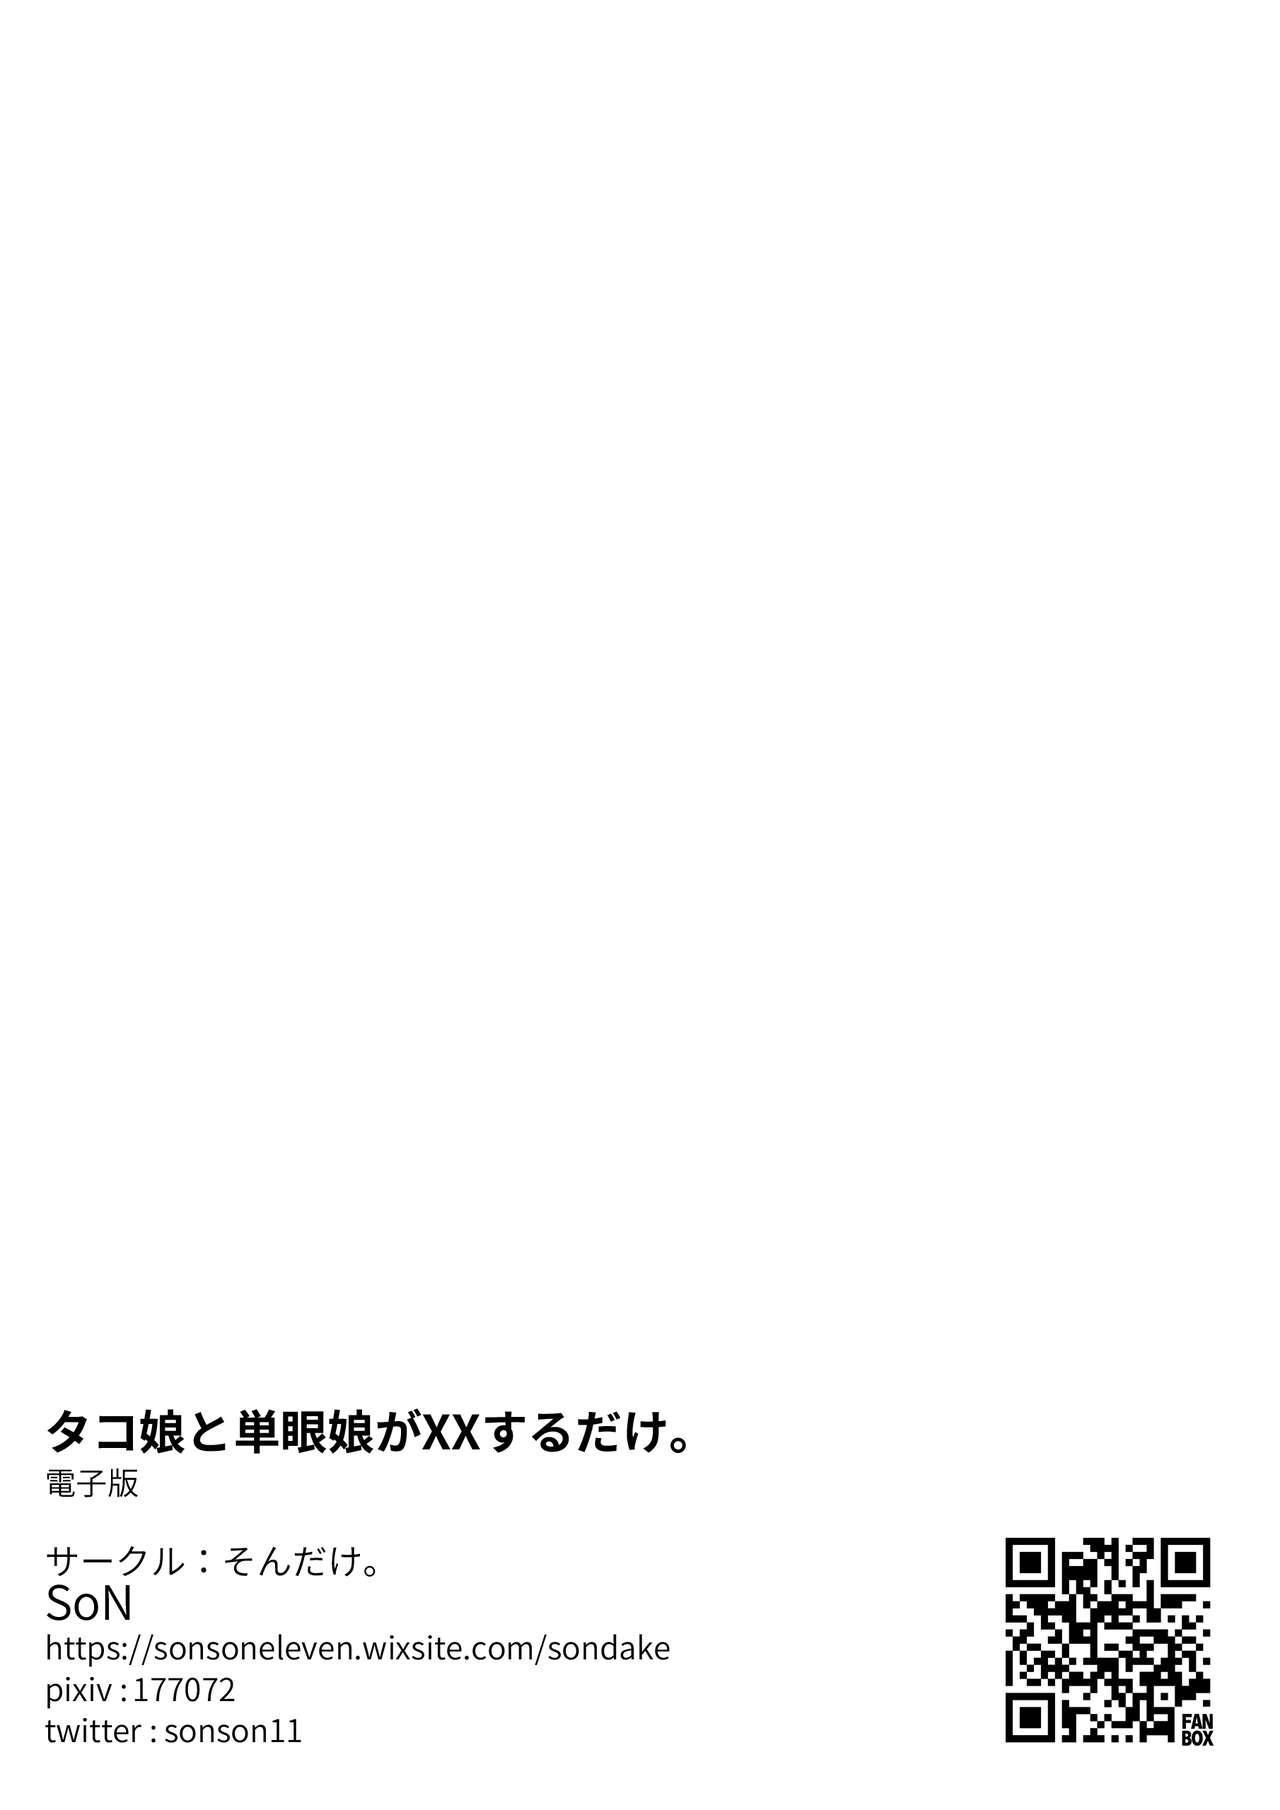 Tako Musume to Tangan Musume ga XX Suru Dake. 22